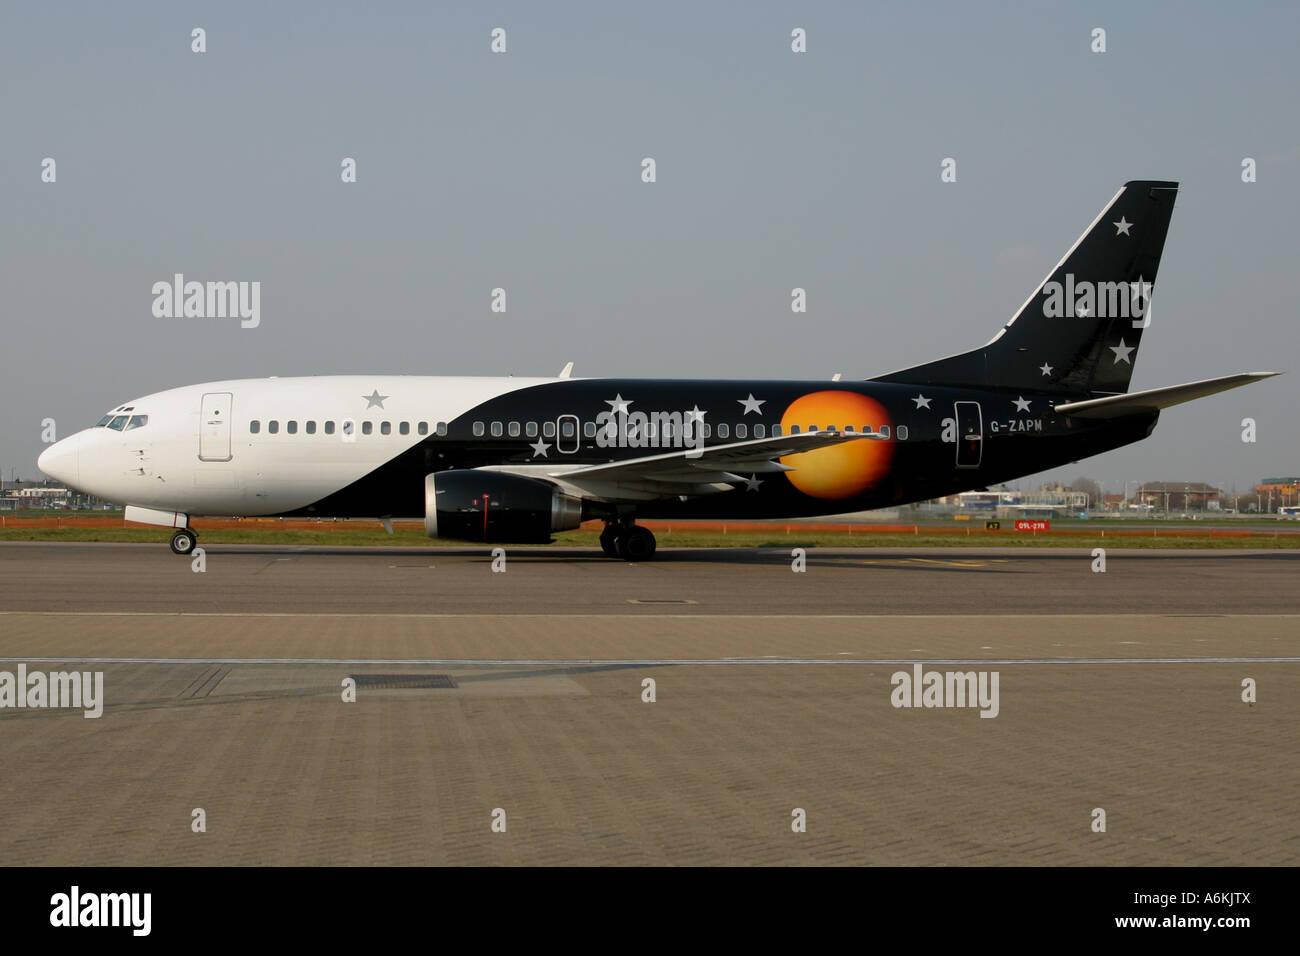 TITAN AIRLINES - Stock Image